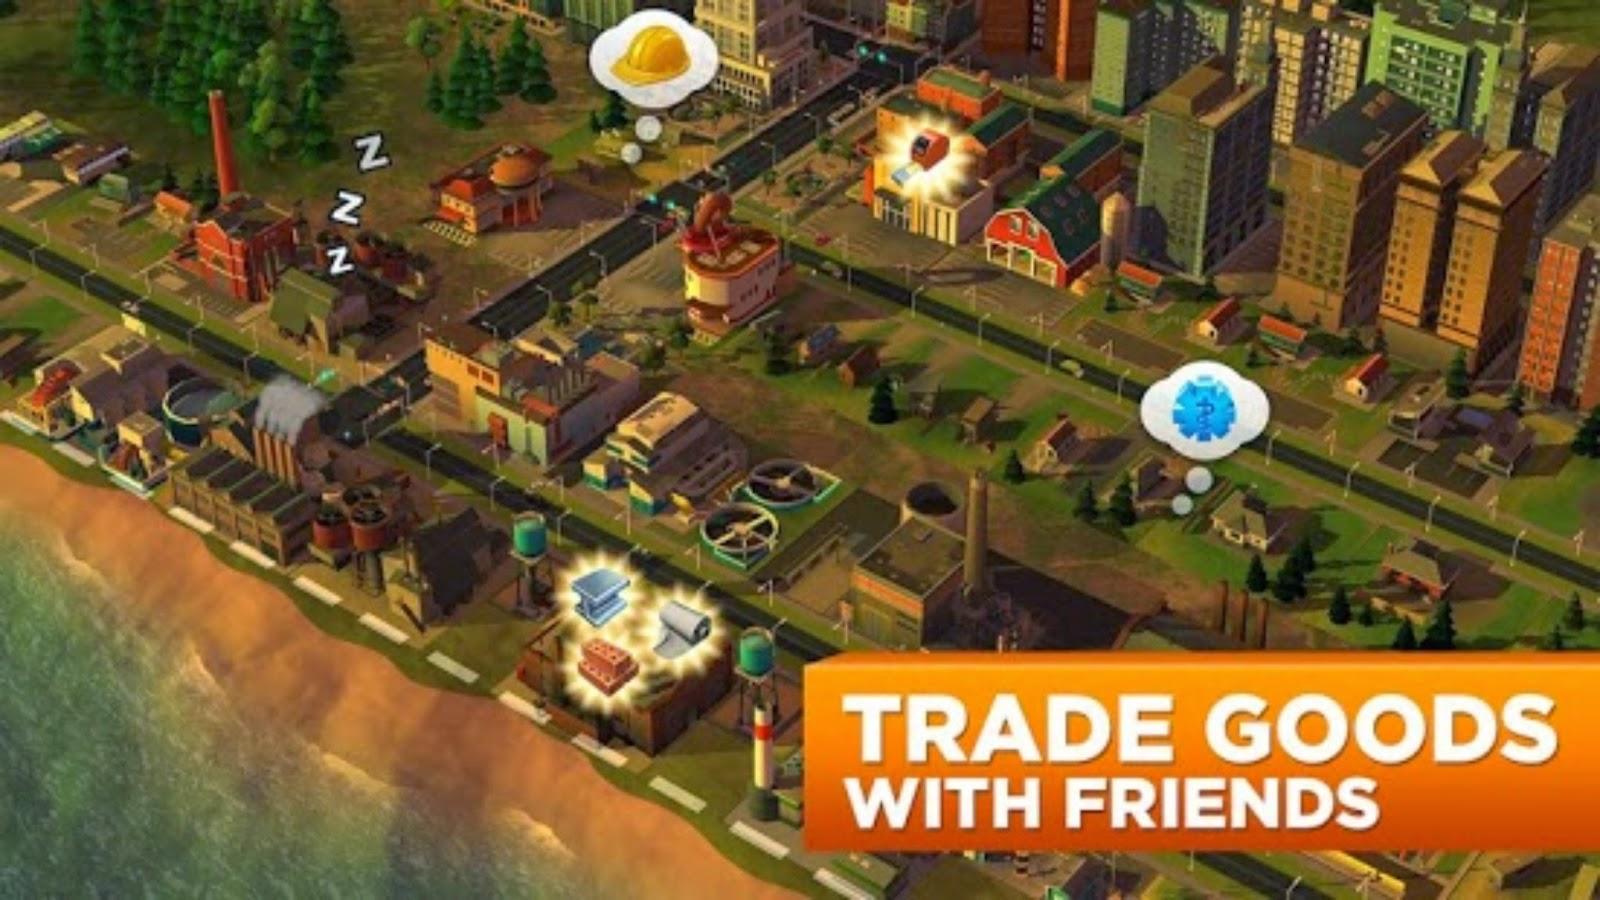 simcity mod apk offline game download